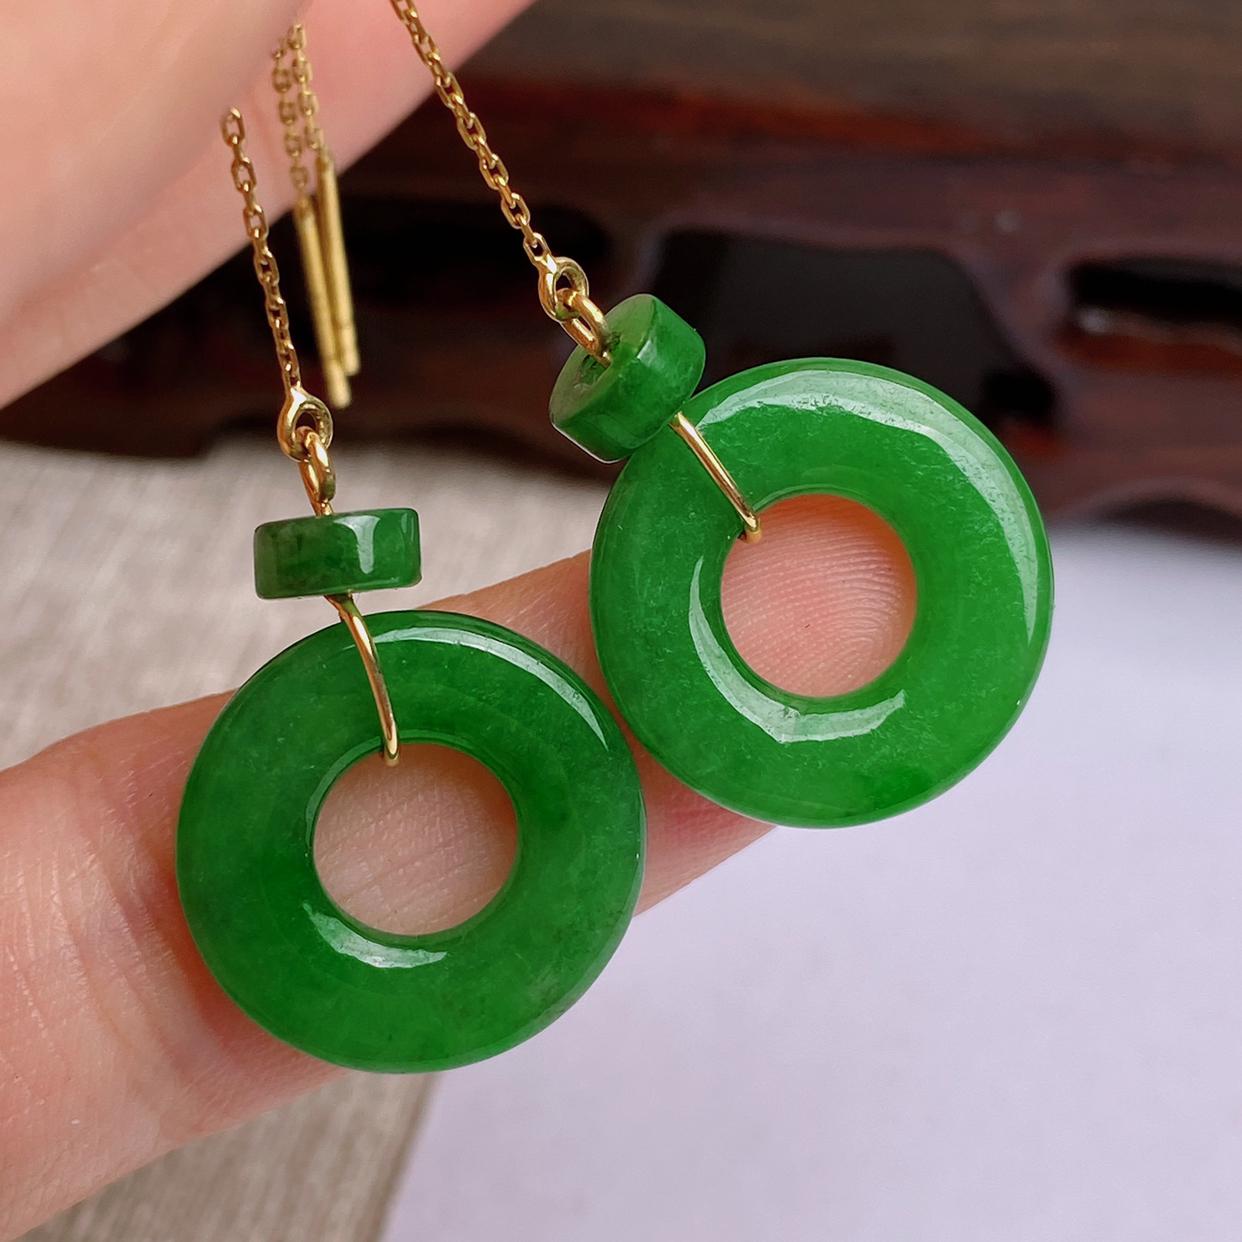 A货翡翠-种好满绿平安环耳坠,尺寸-16.1*2.5mm,耳线为925银